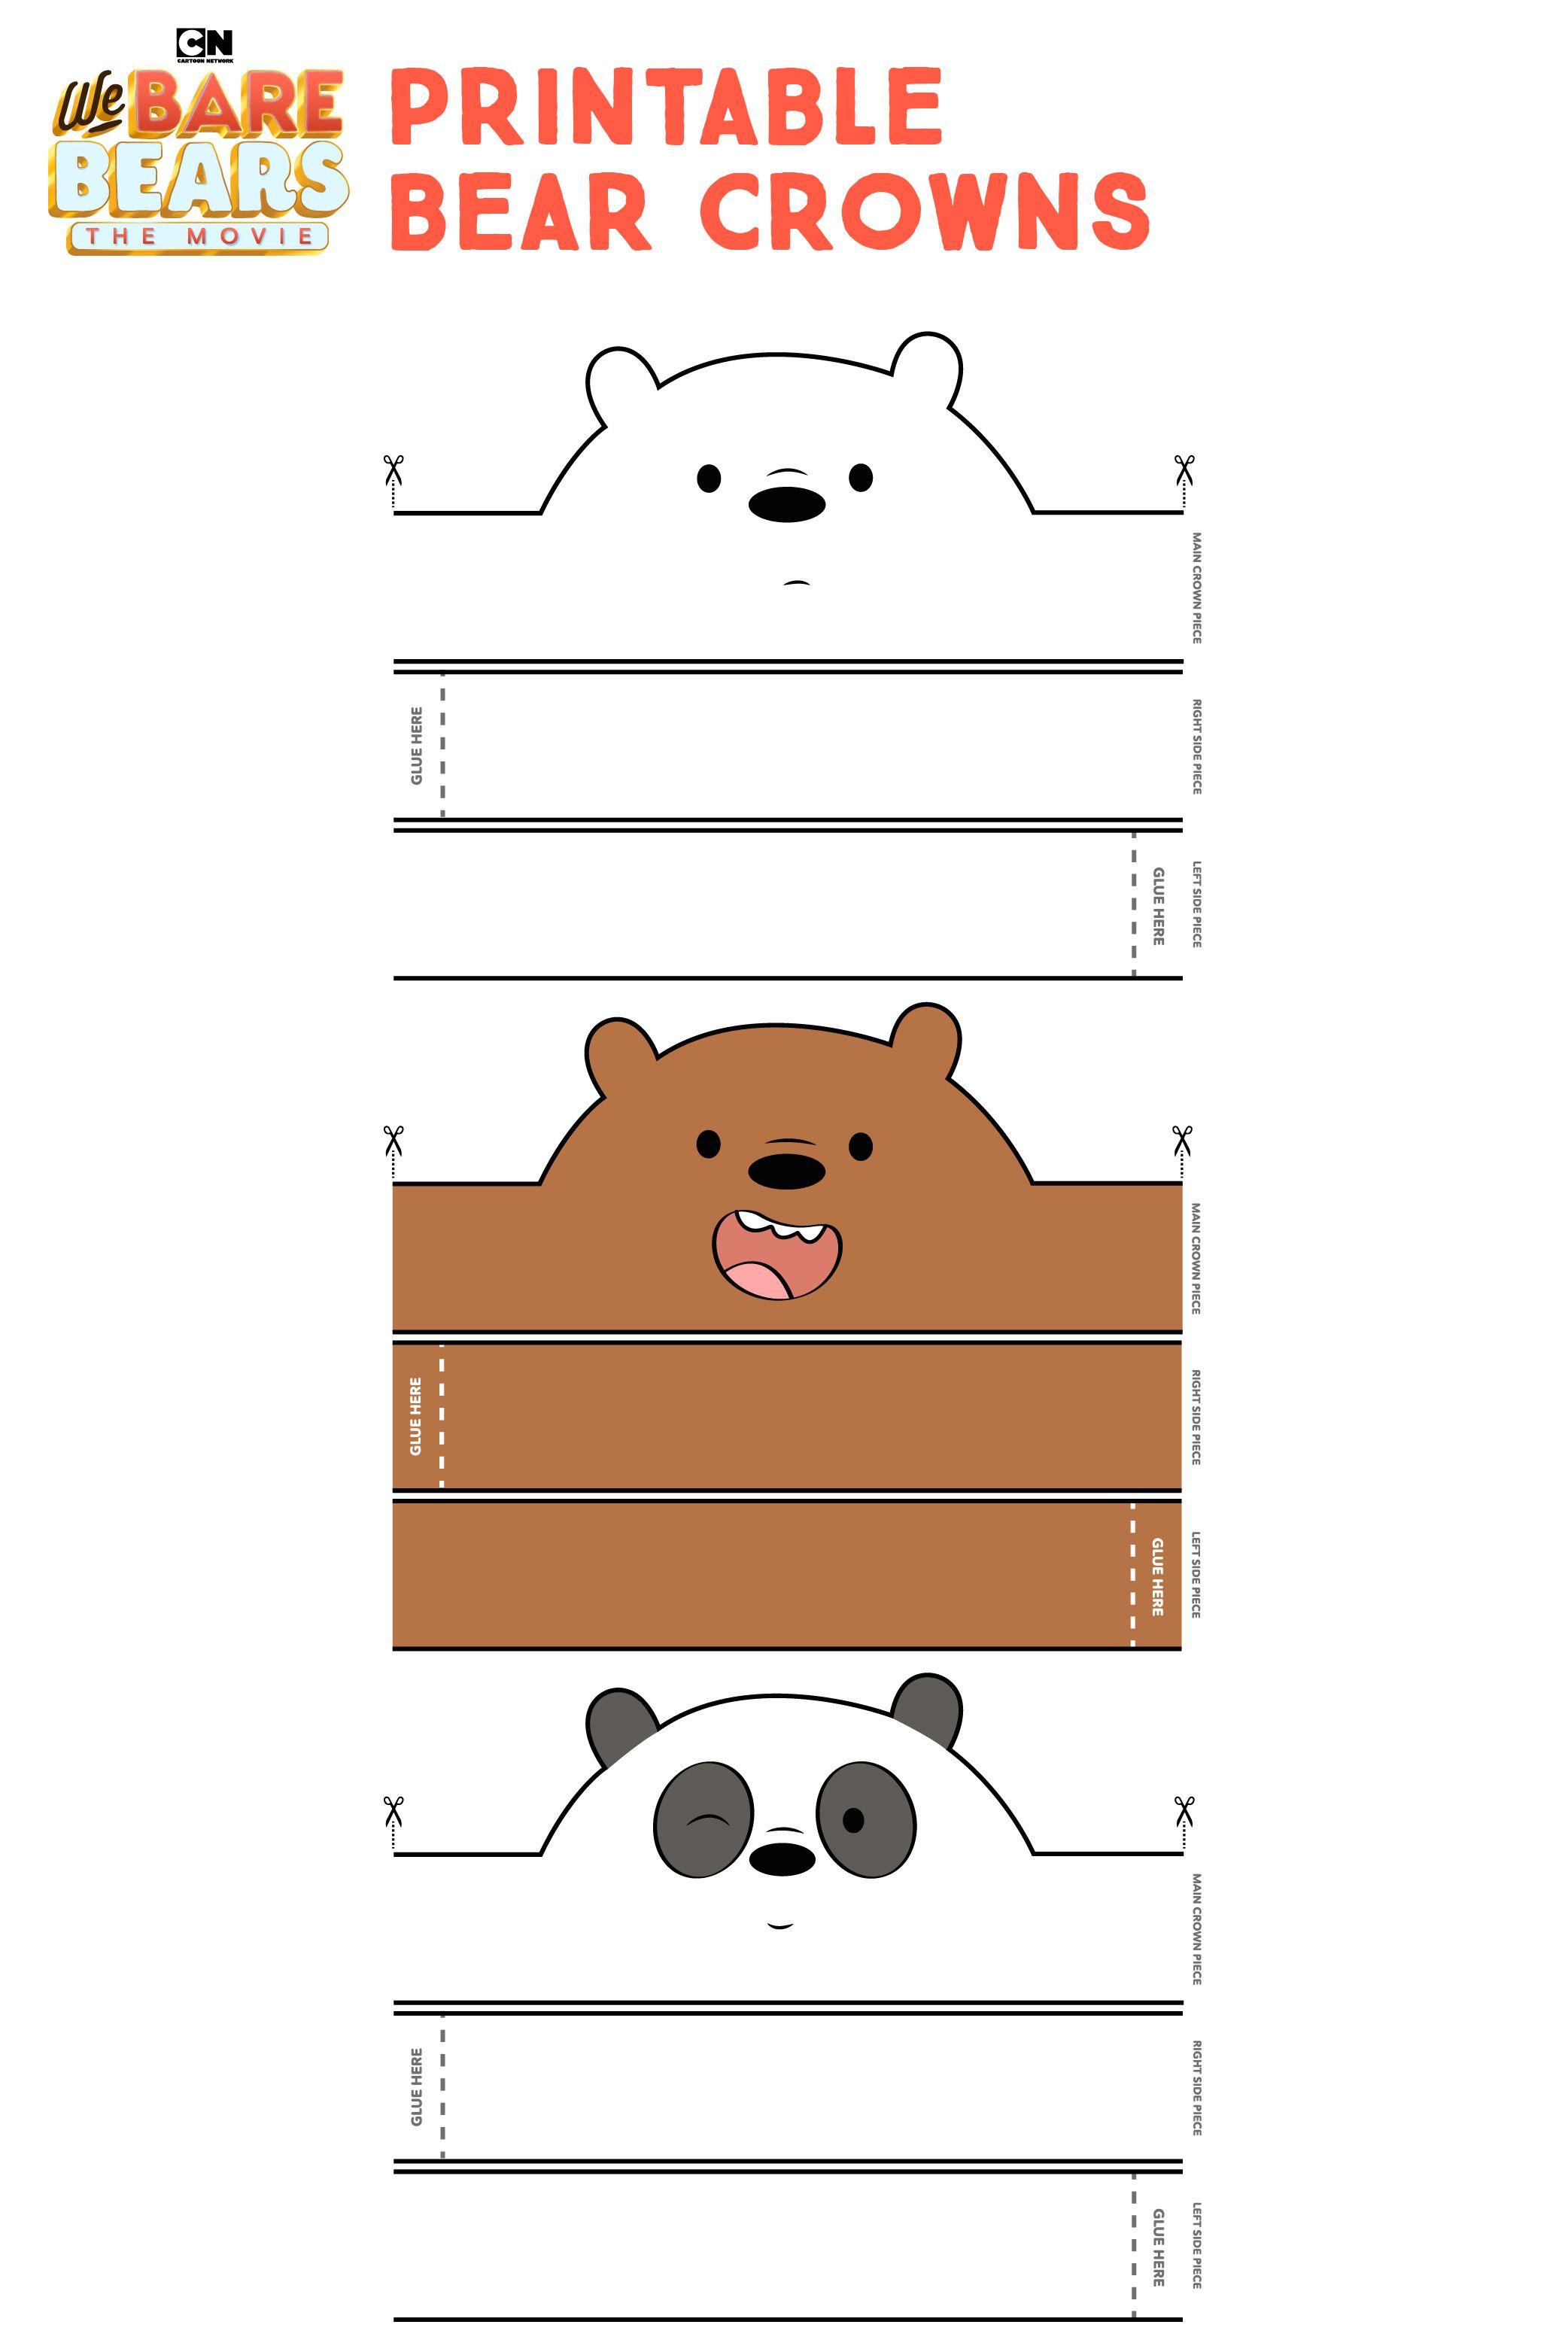 We Bear Bears Printable Bear Crowns We Bare Bears Bear Decorations Party Bare Bears